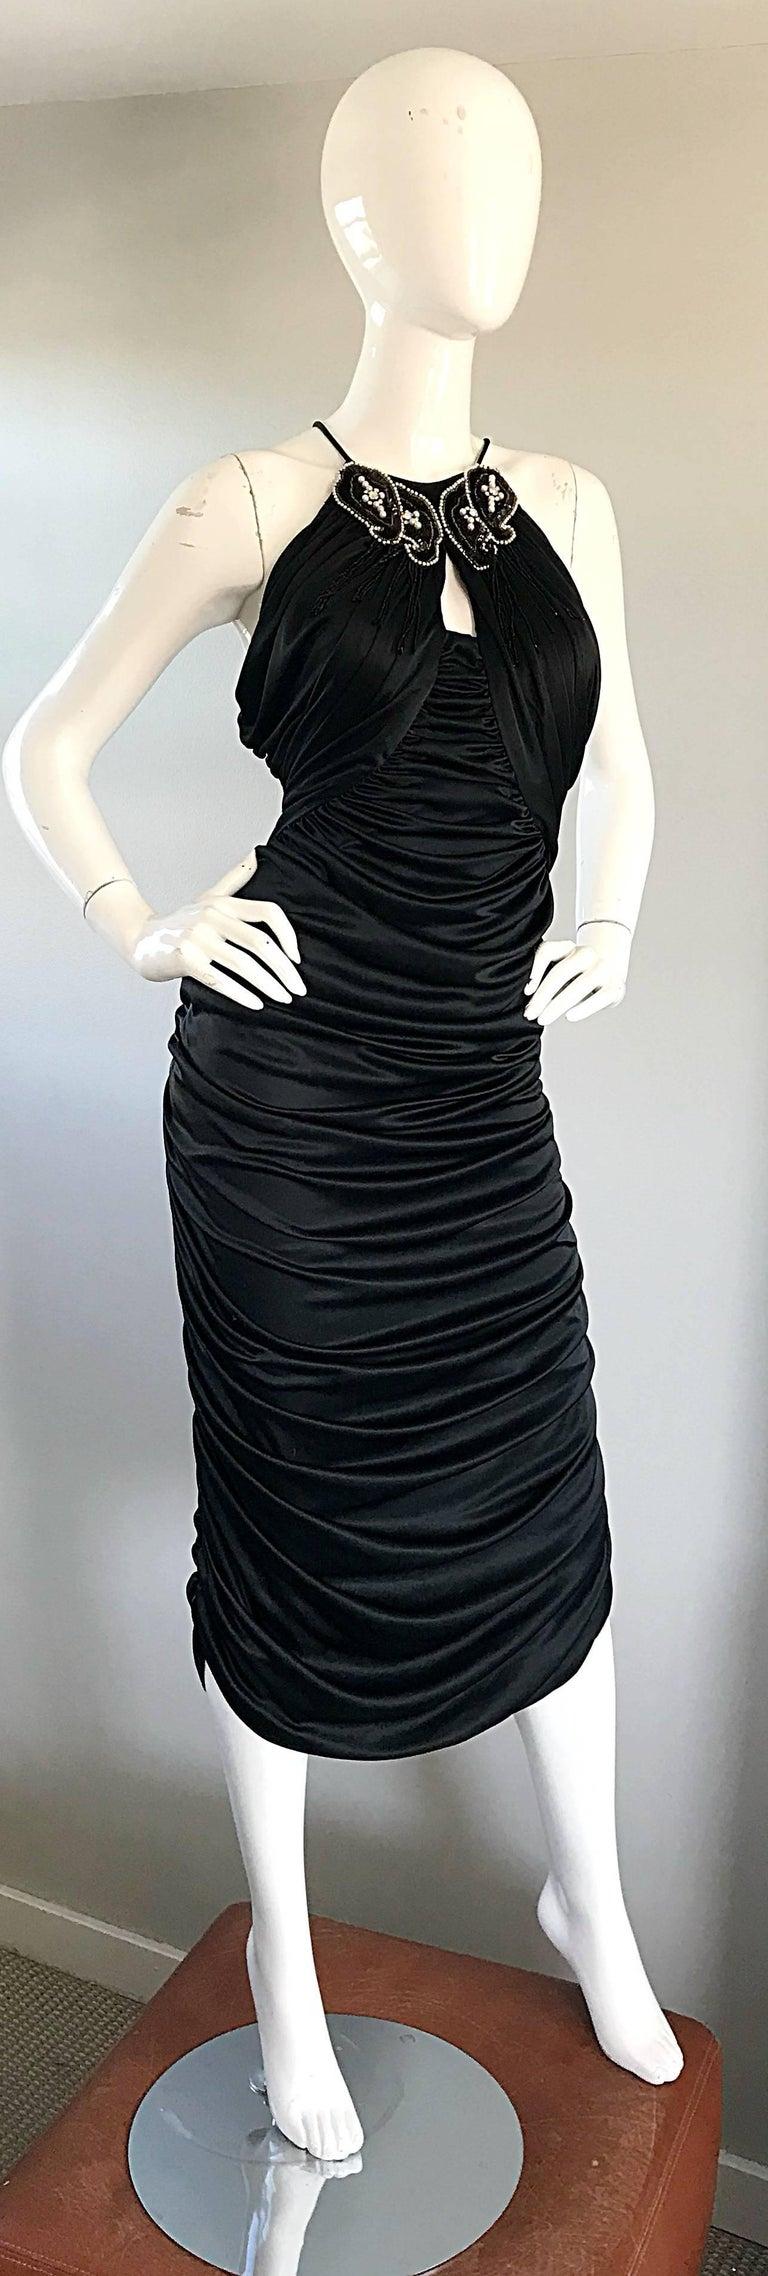 1970s Vintage Samir Black Beaded + Pearl + Rhinestone Sexy Ruched 70s Dress 3